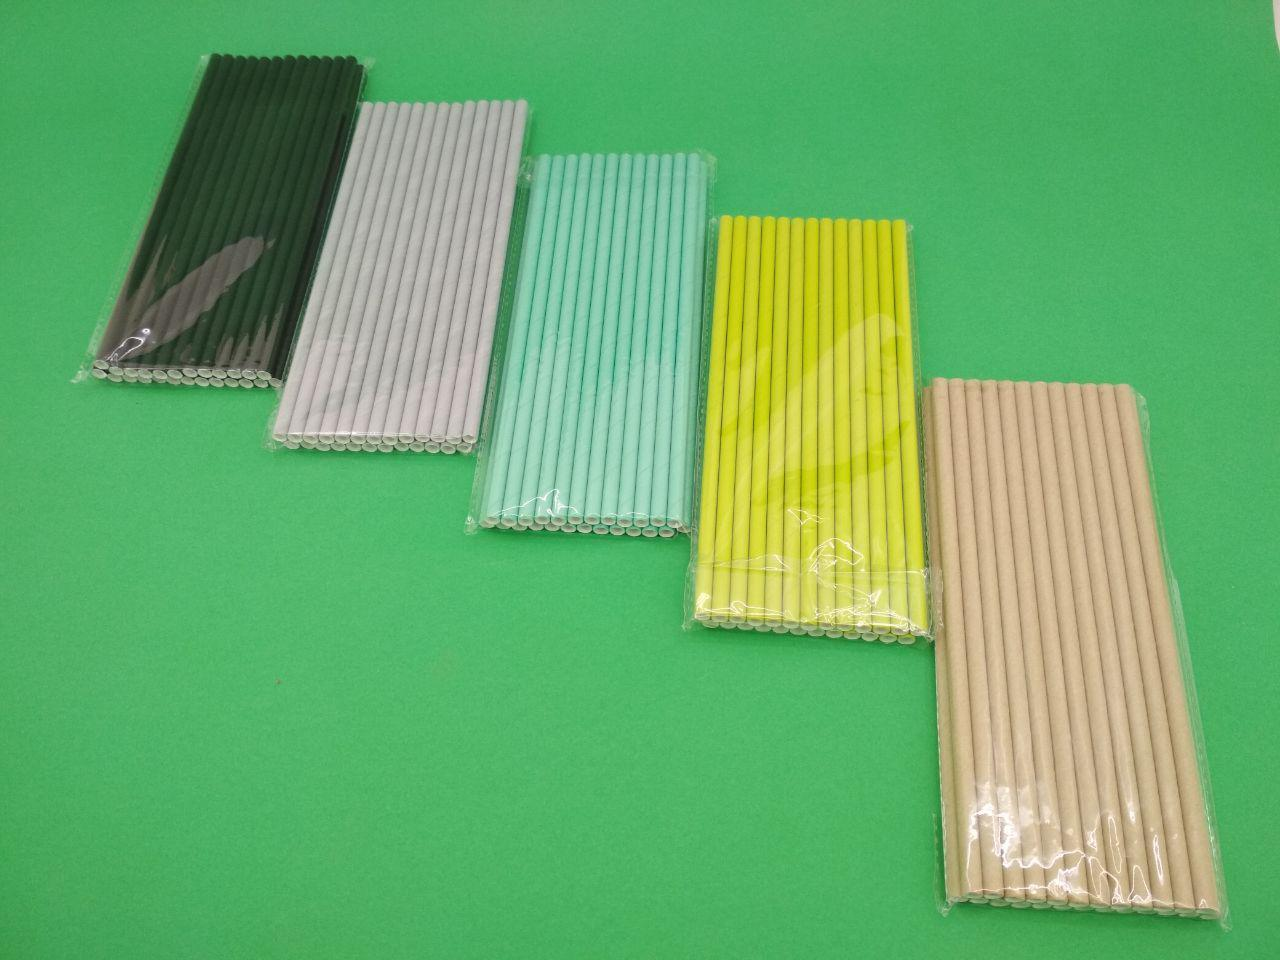 Соломка паперова трубочка 25шт однотонна асорті (1 пач.)